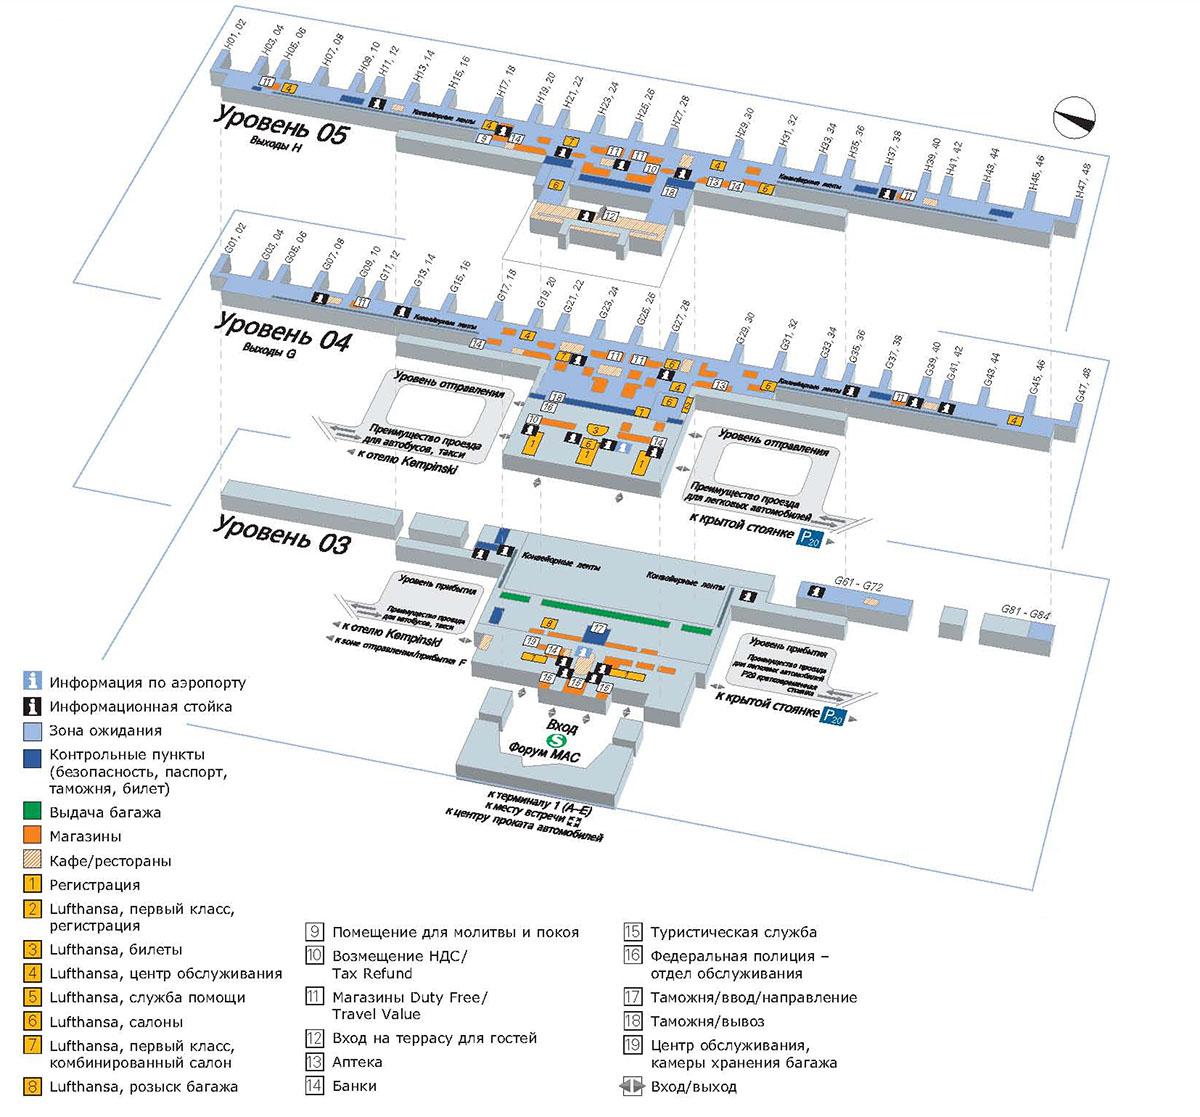 Схема терминала 2 аэропорта Мюнхена